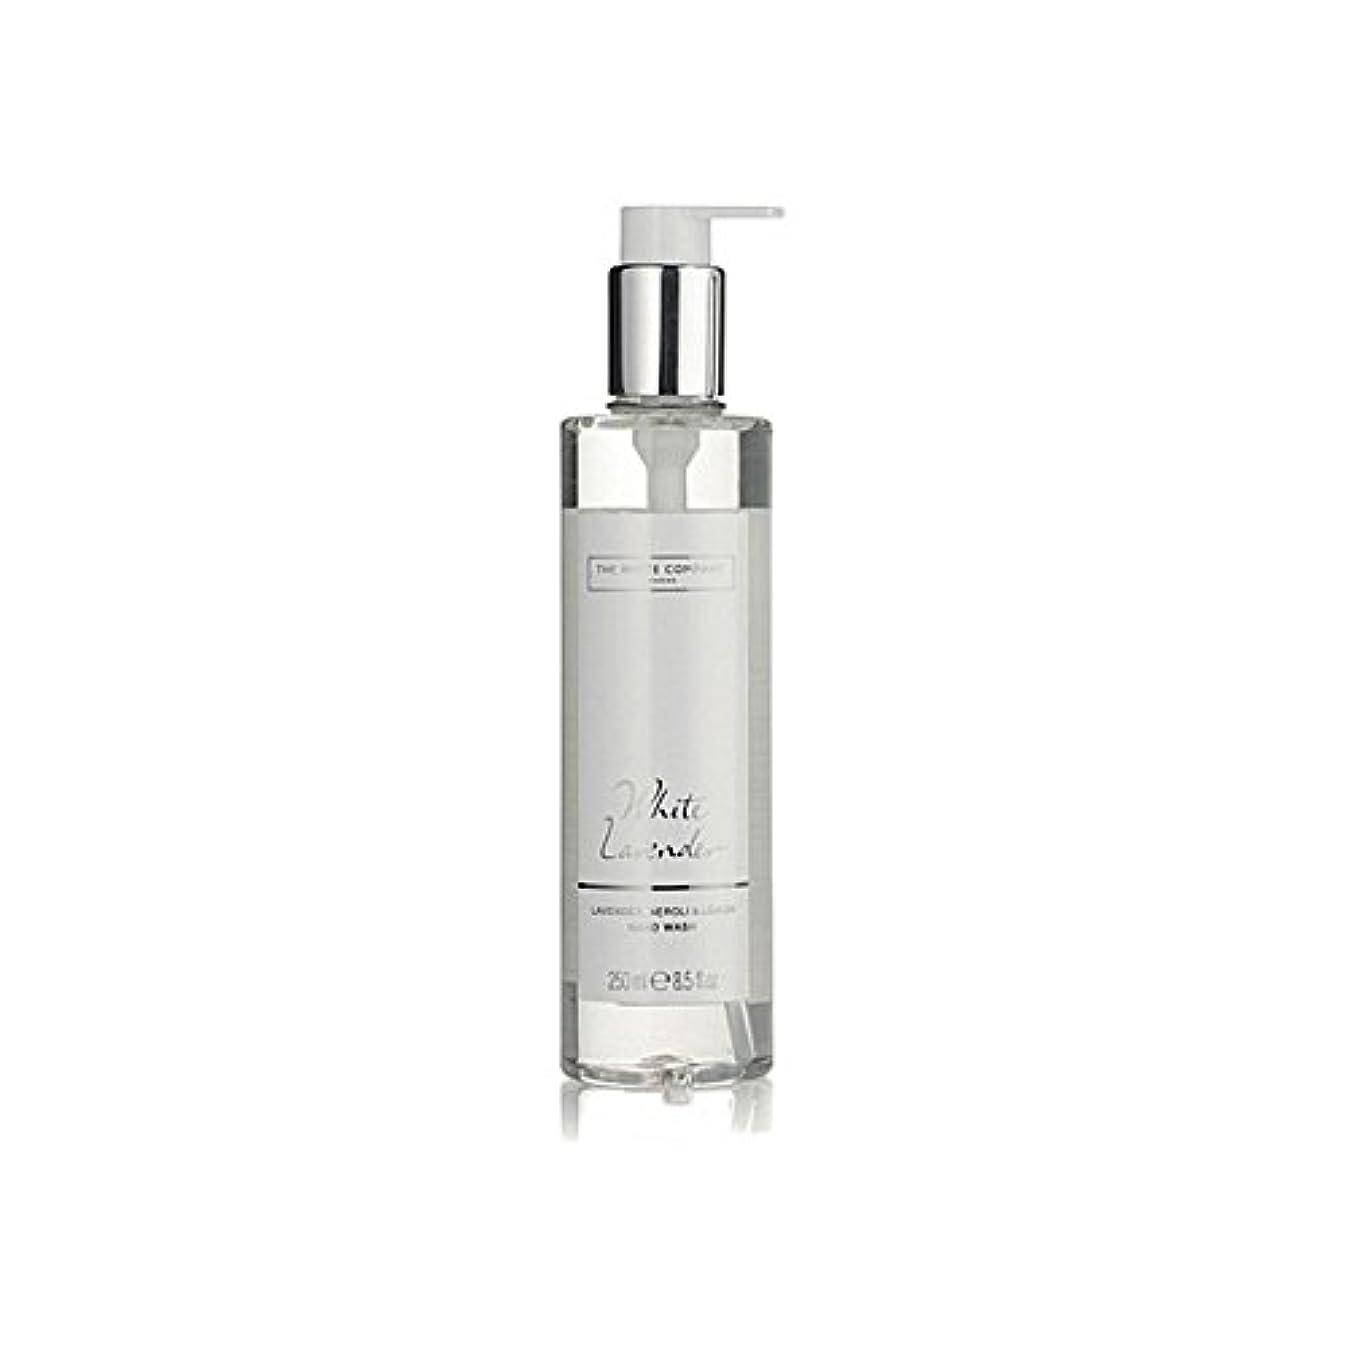 The White Company White Lavender Hand Wash (Pack of 6) - 白同社白ラベンダーハンドウォッシュ x6 [並行輸入品]